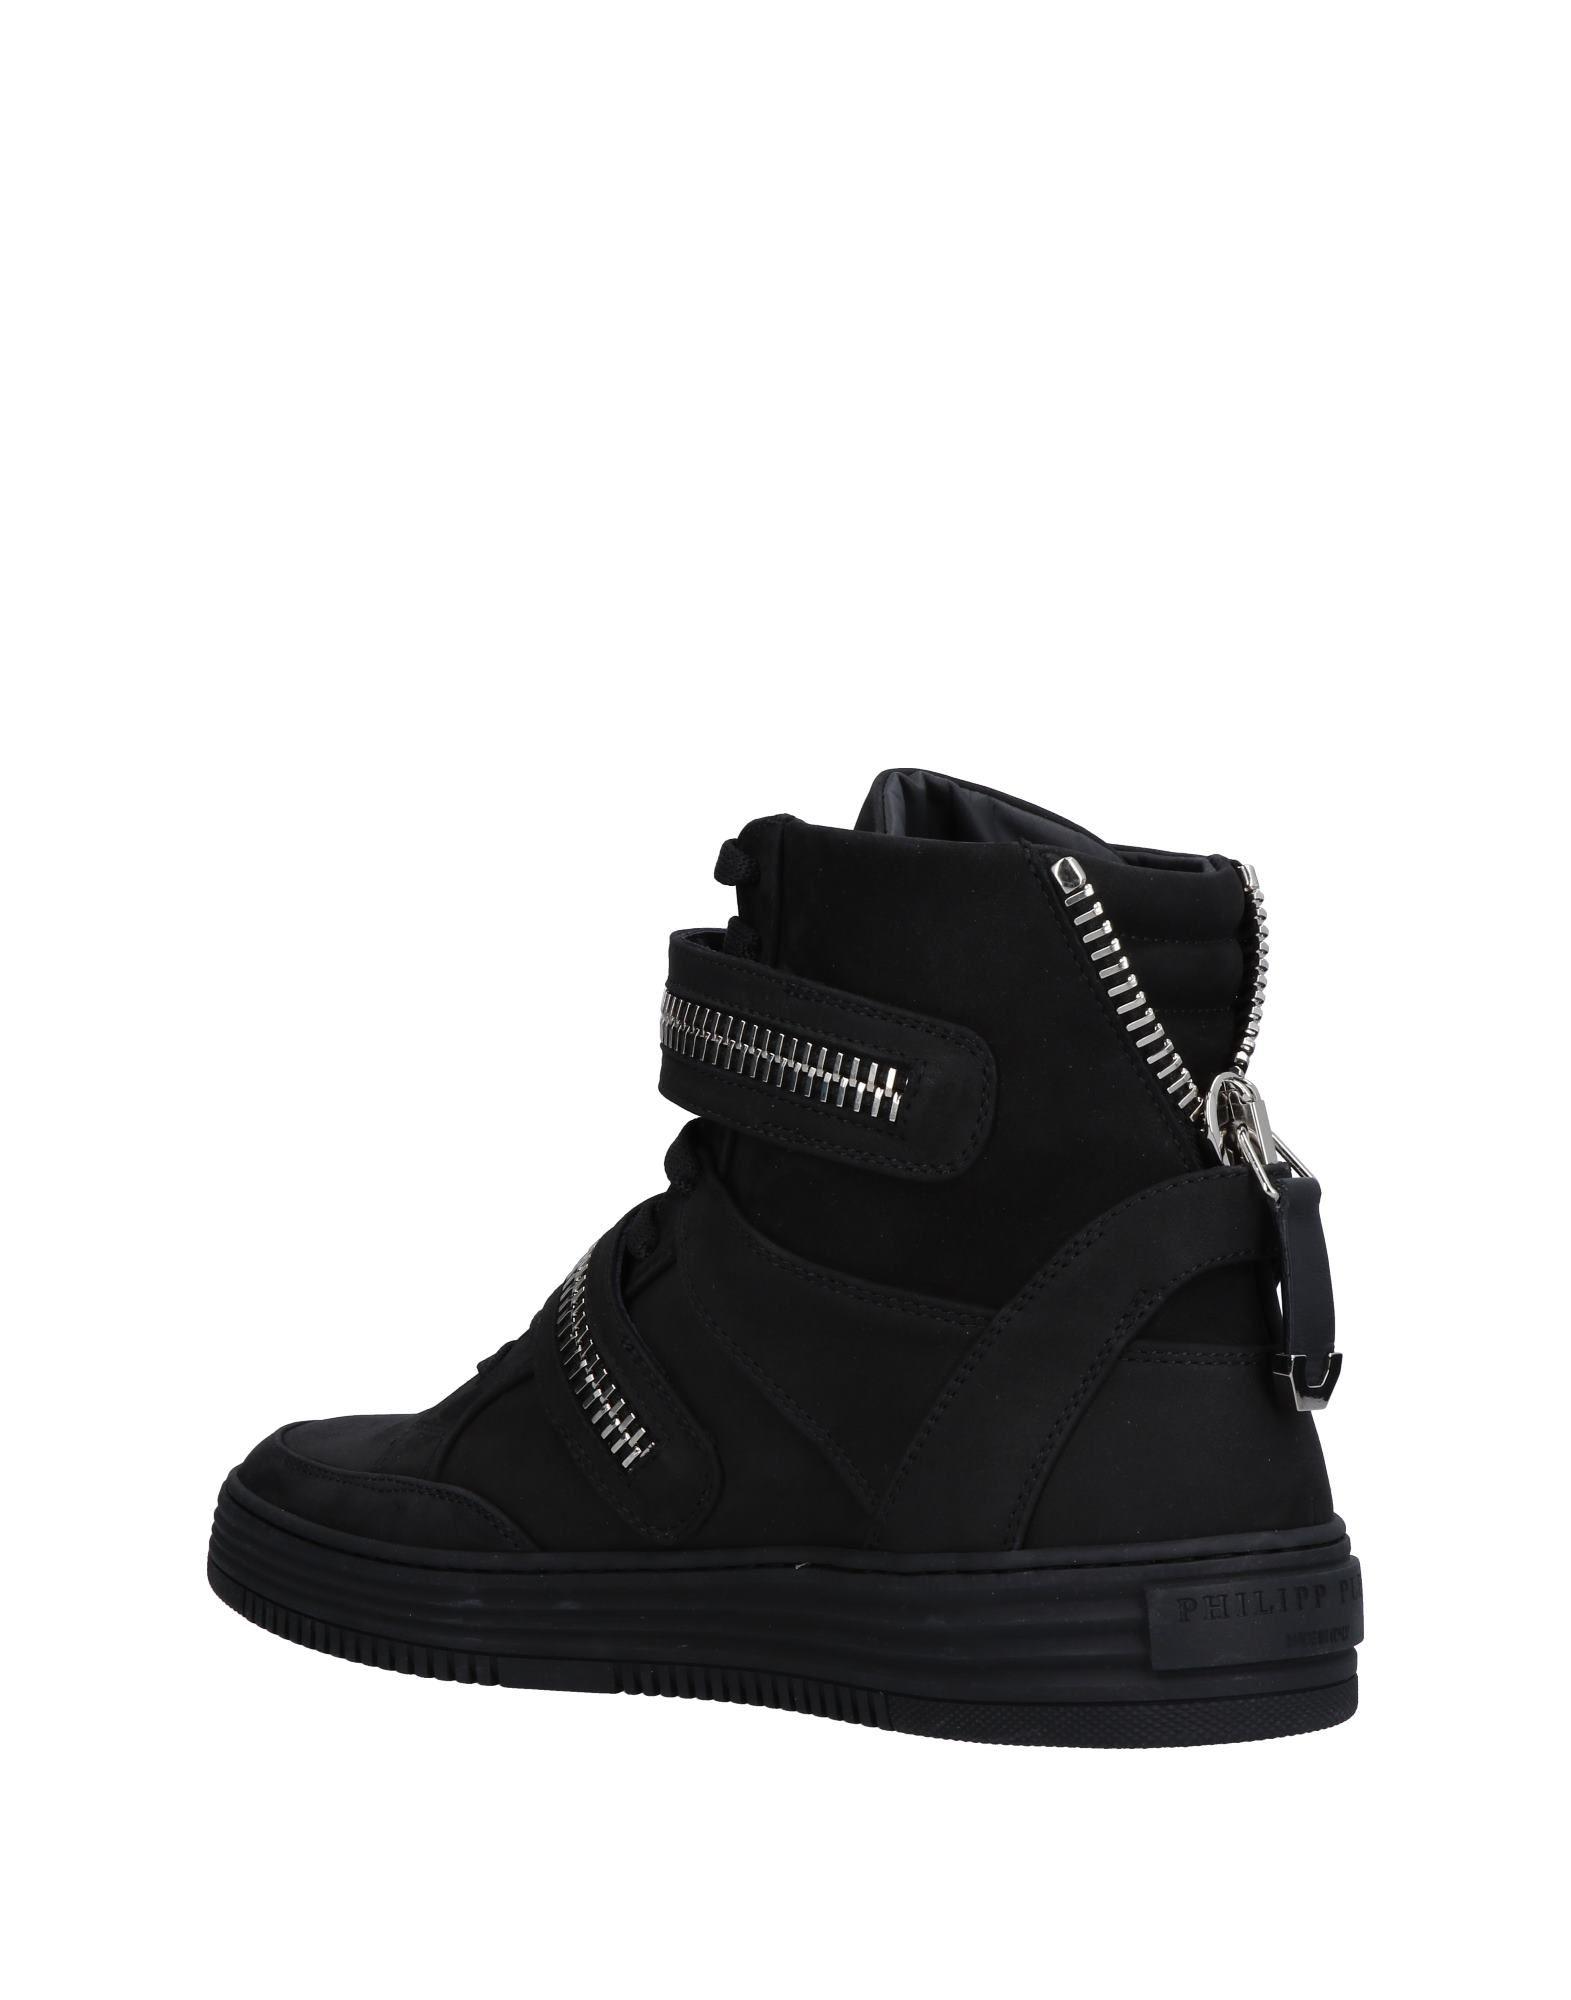 Philipp Plein Sneakers 11505346OM Herren  11505346OM Sneakers 4ed15a